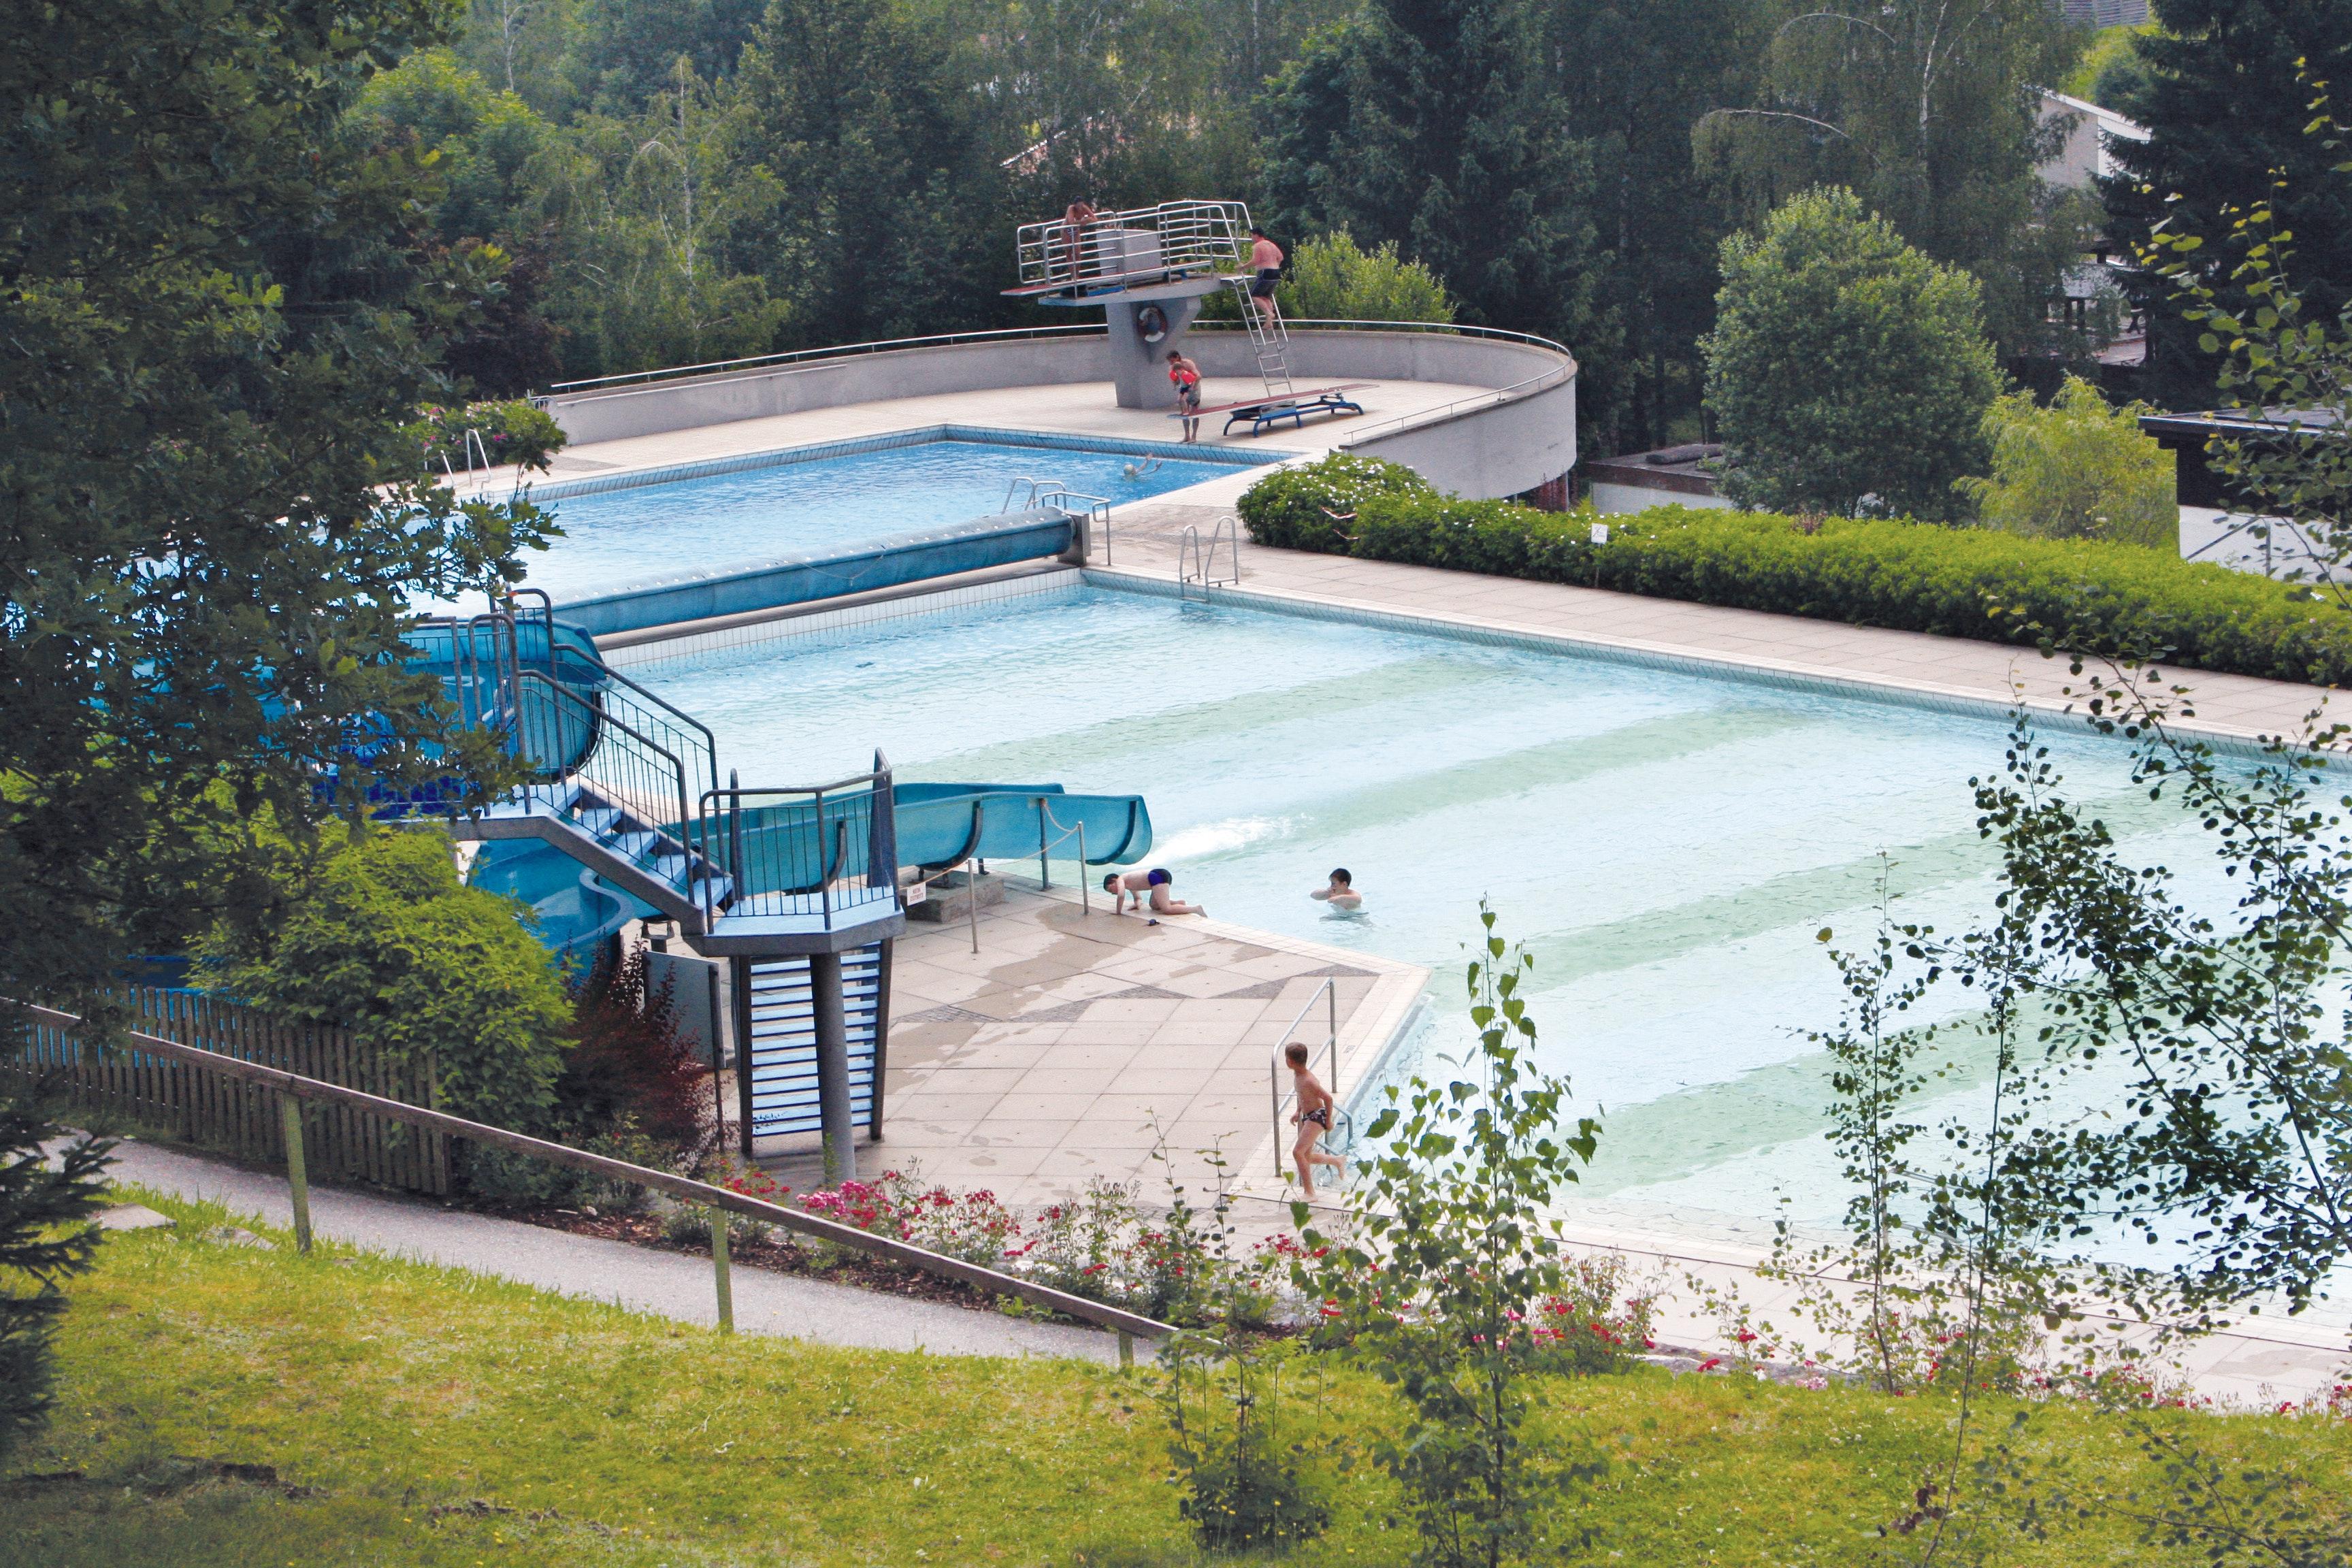 Buitenzwembad campingpark knaus Viechtach